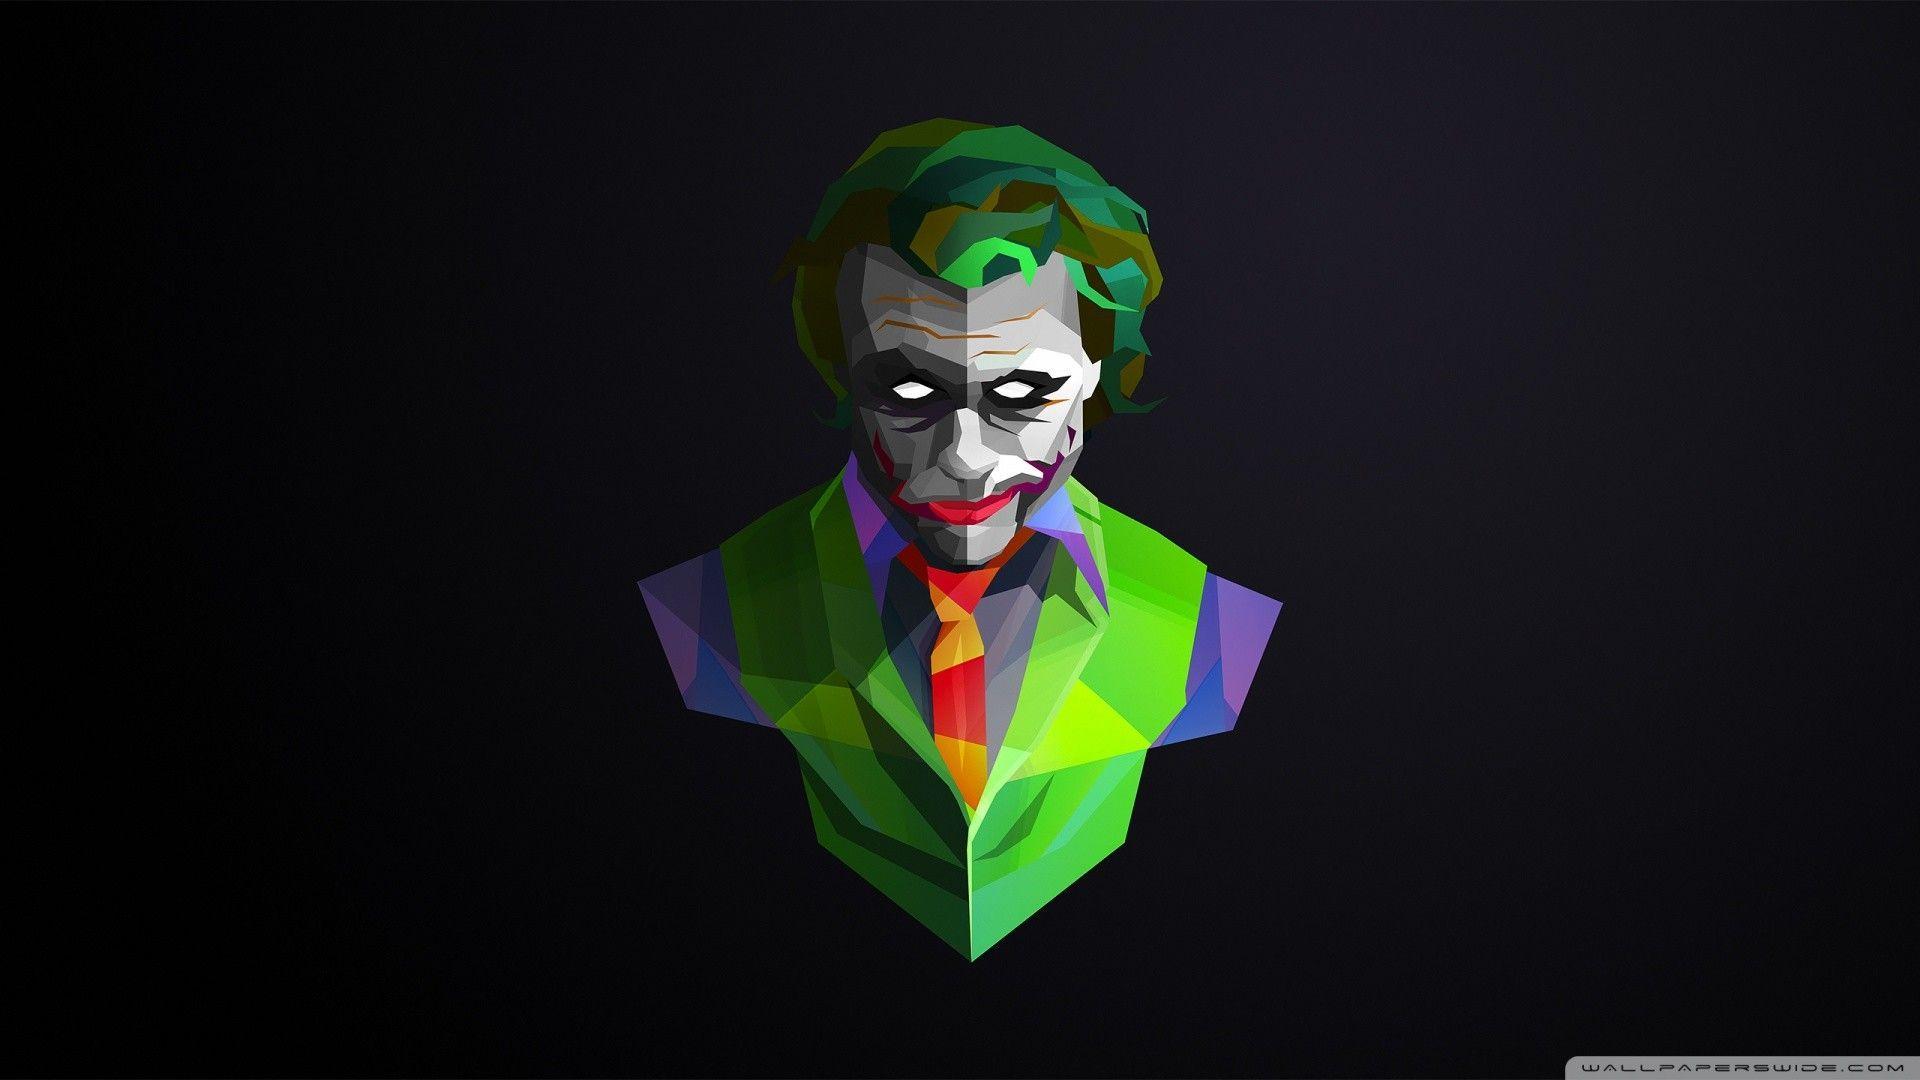 1920x1080 Download Joker Comic Wallpaper30